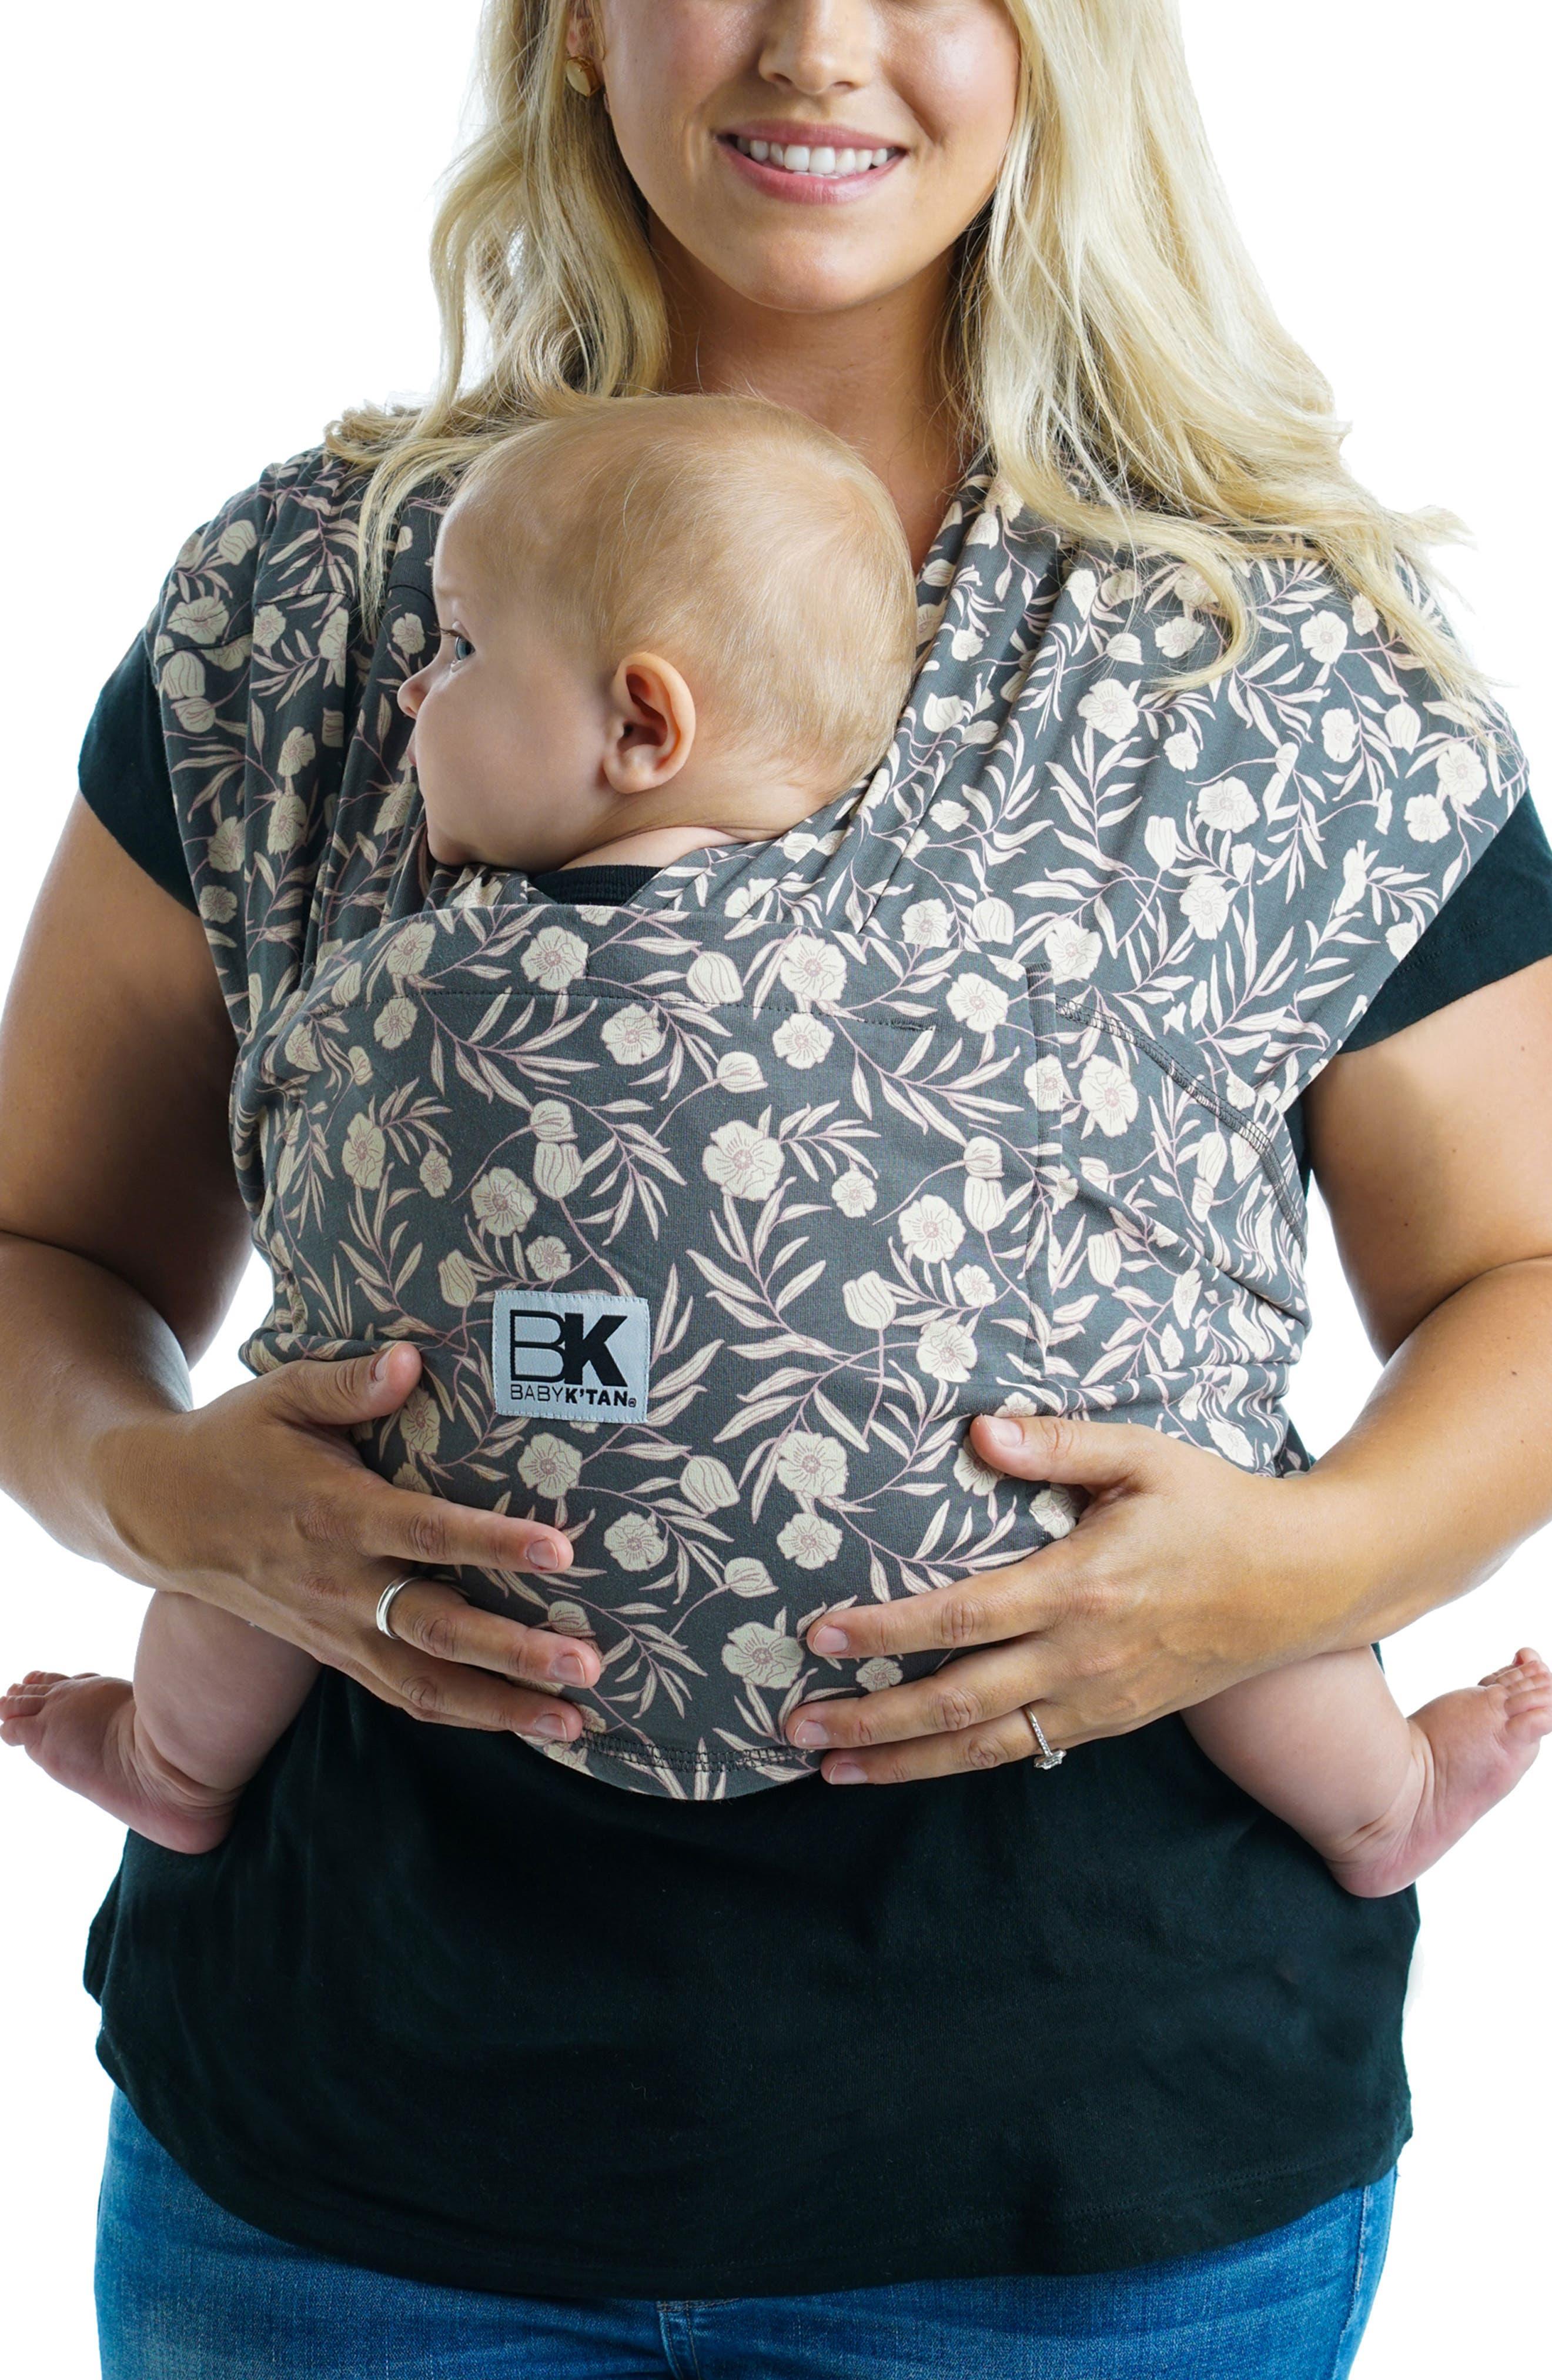 Baby K'Tan Infant Baby K'Tan Original Floral Garden Baby Carrier, Size Medium - Grey